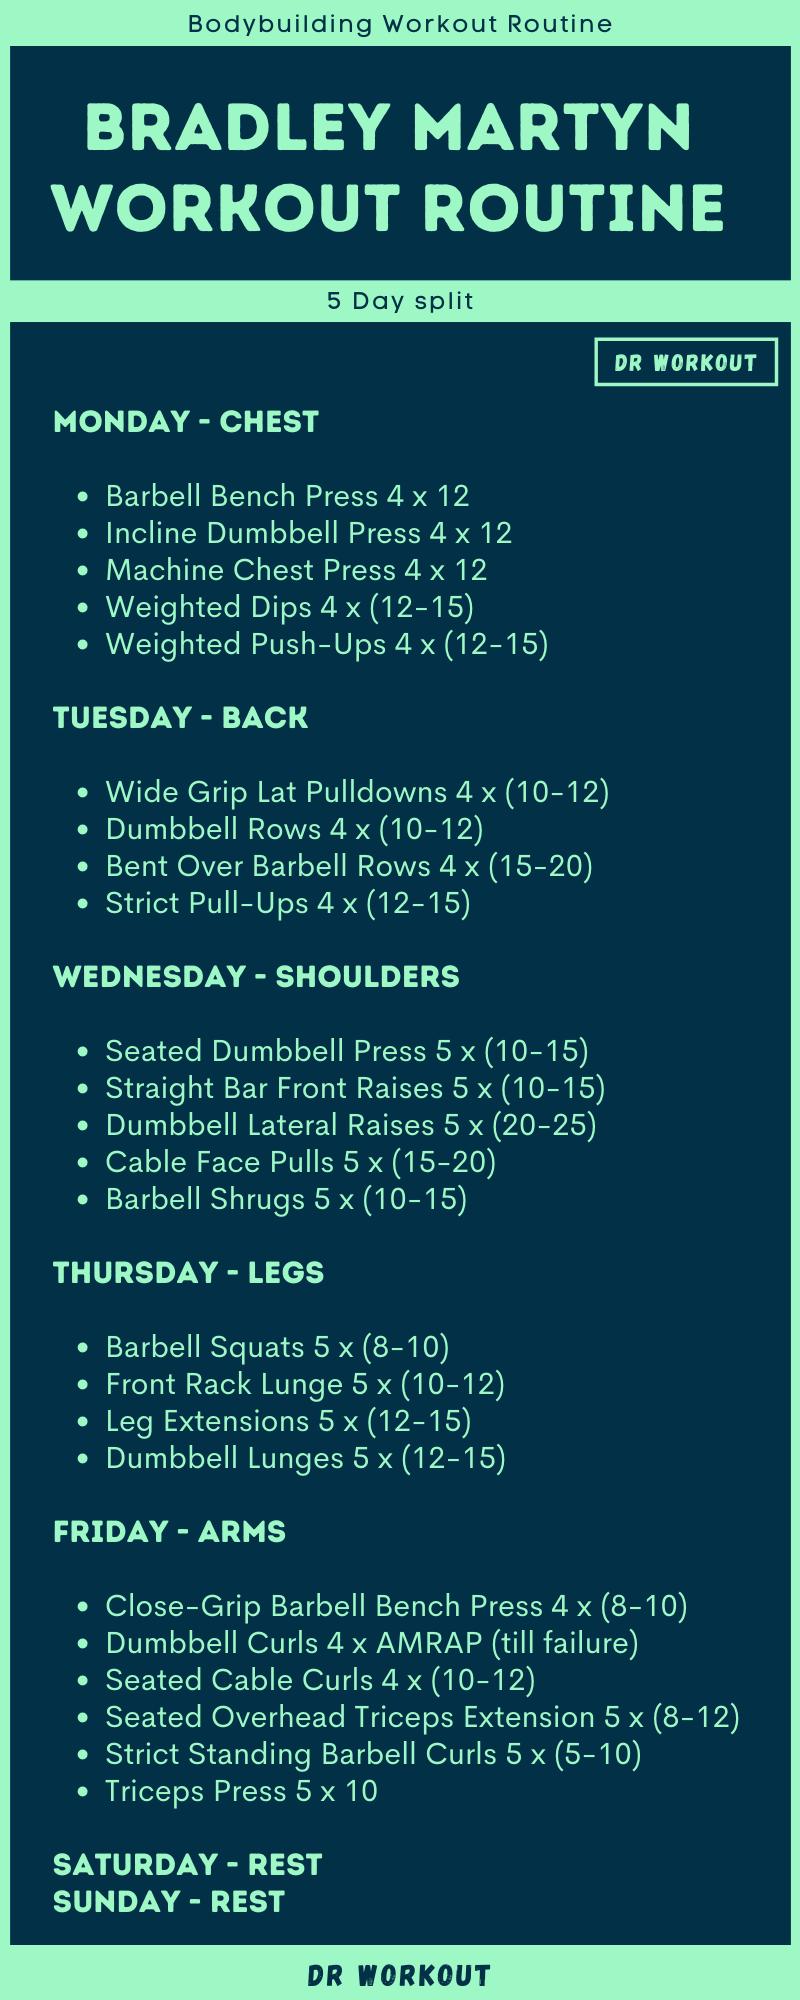 Bradley Martyn S Workout Routine Dr Workout